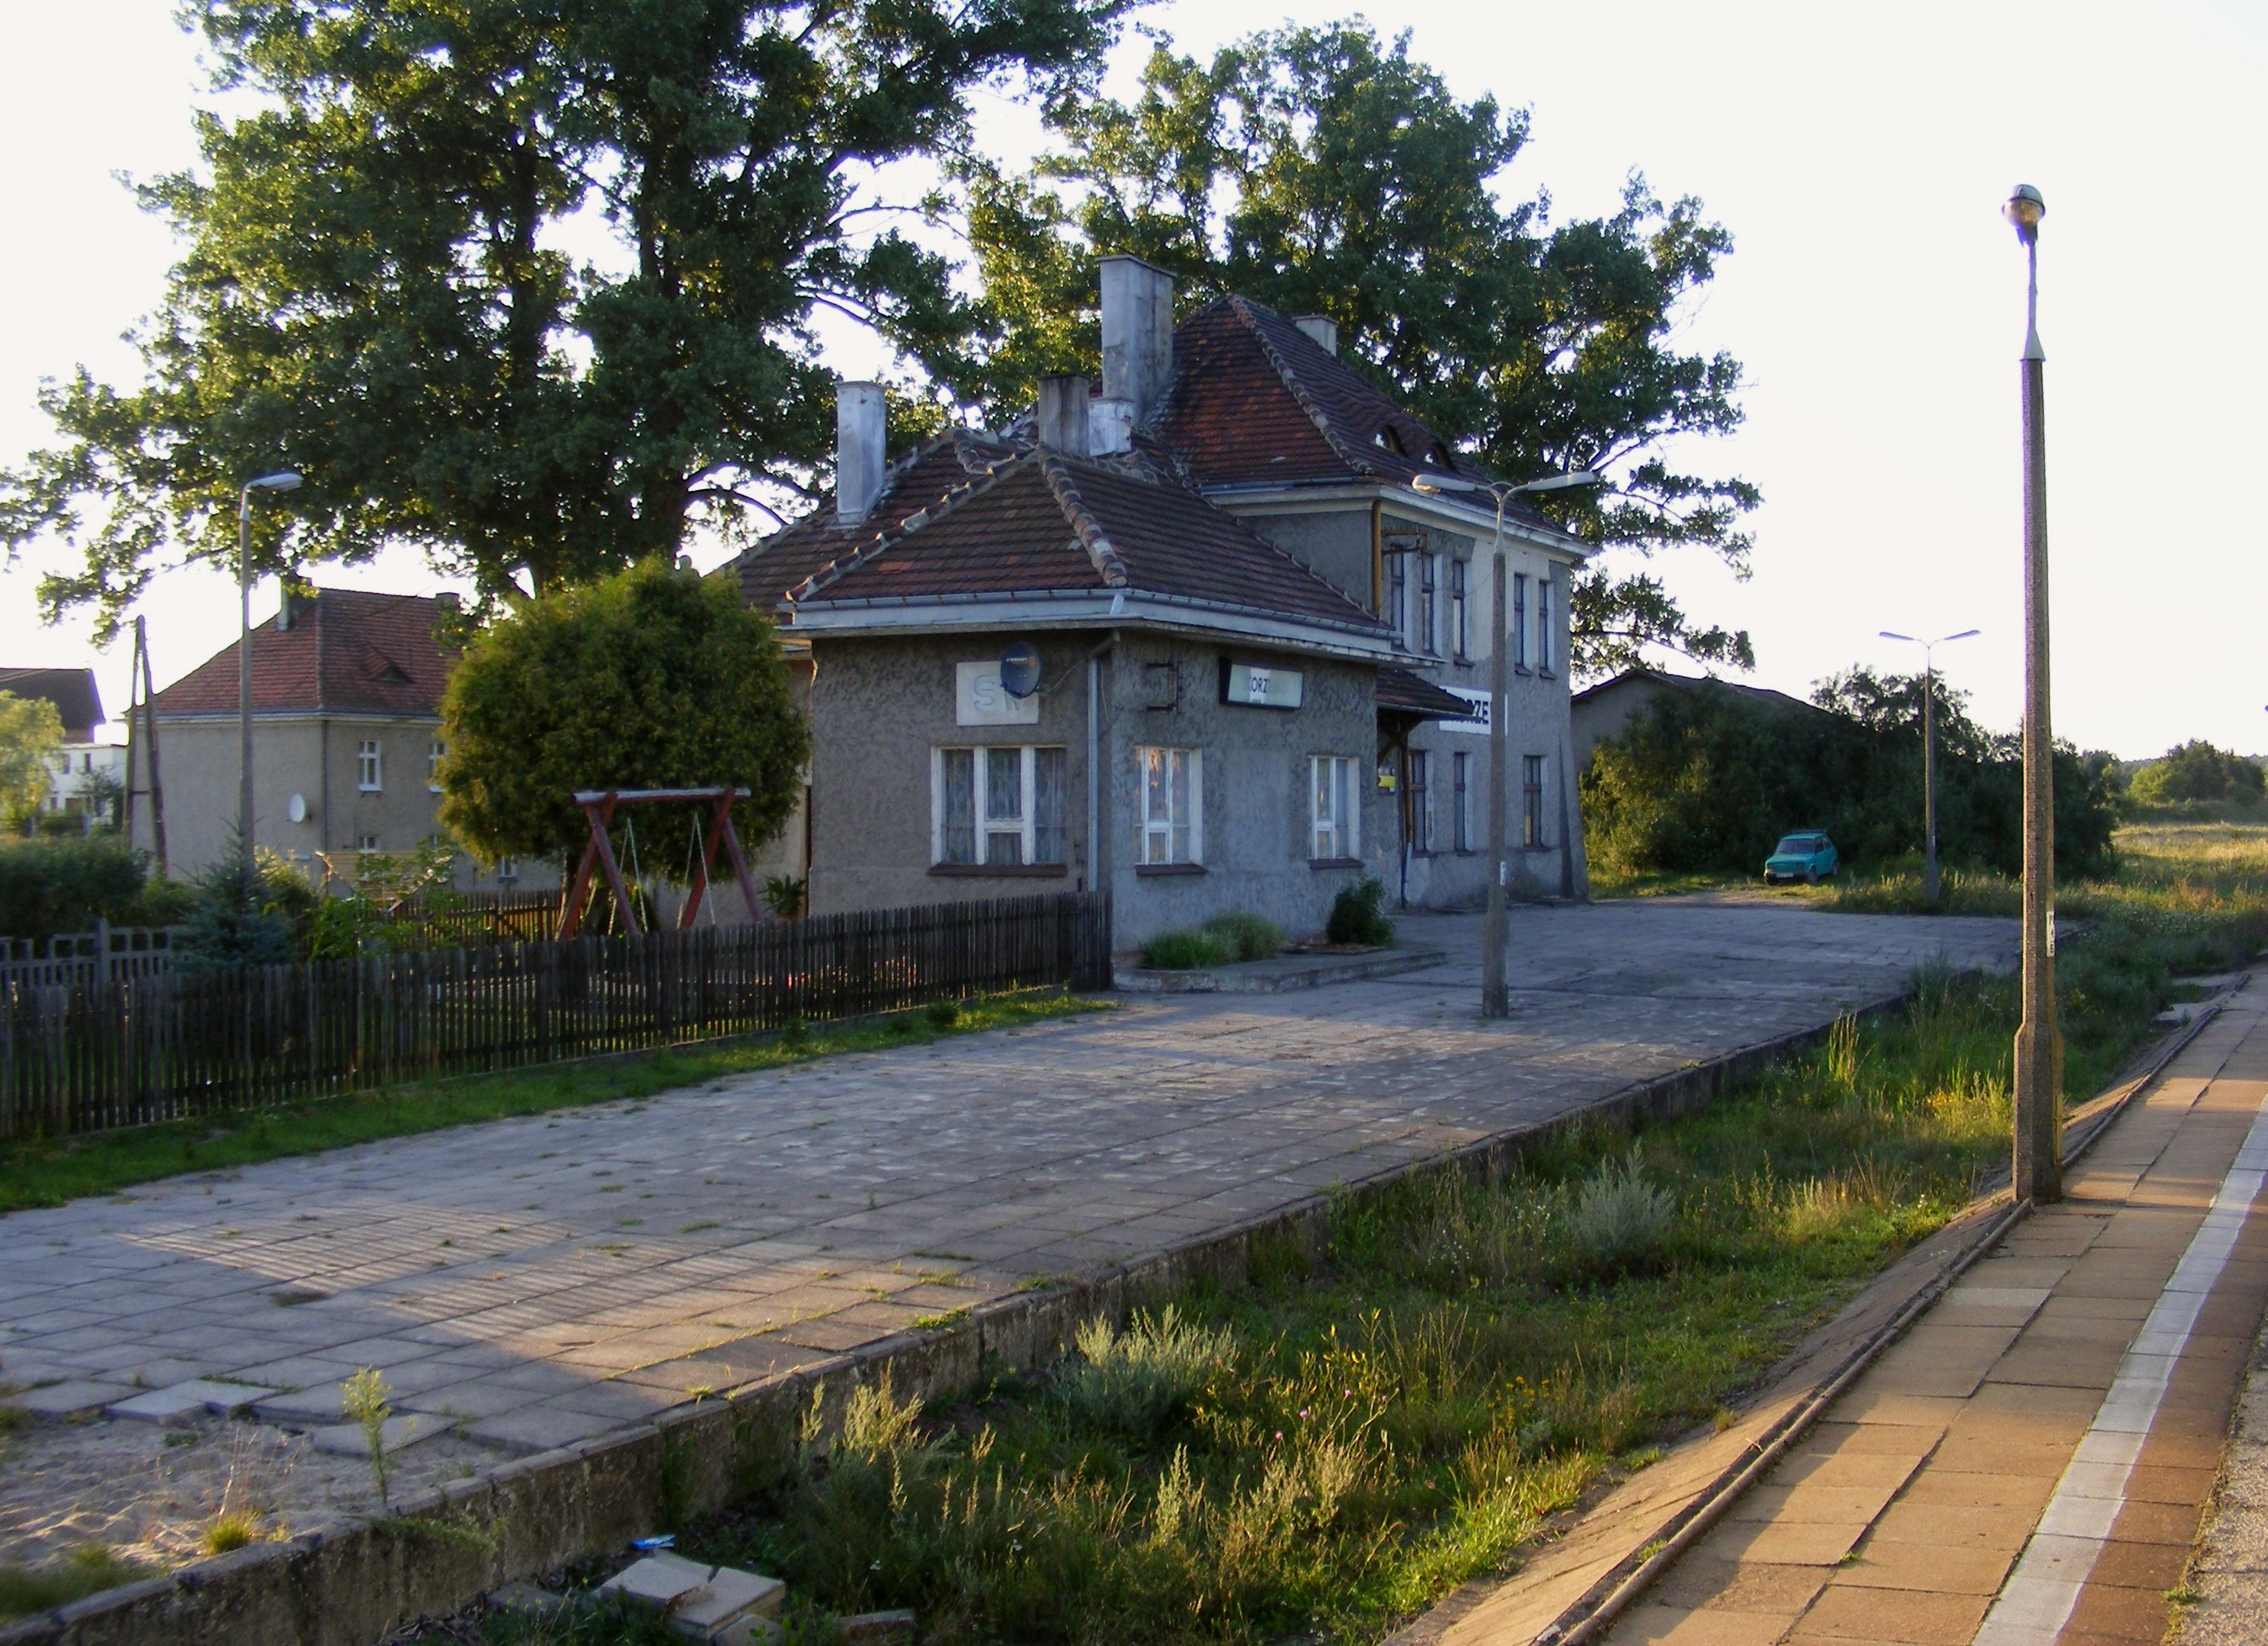 Station Skorzewo